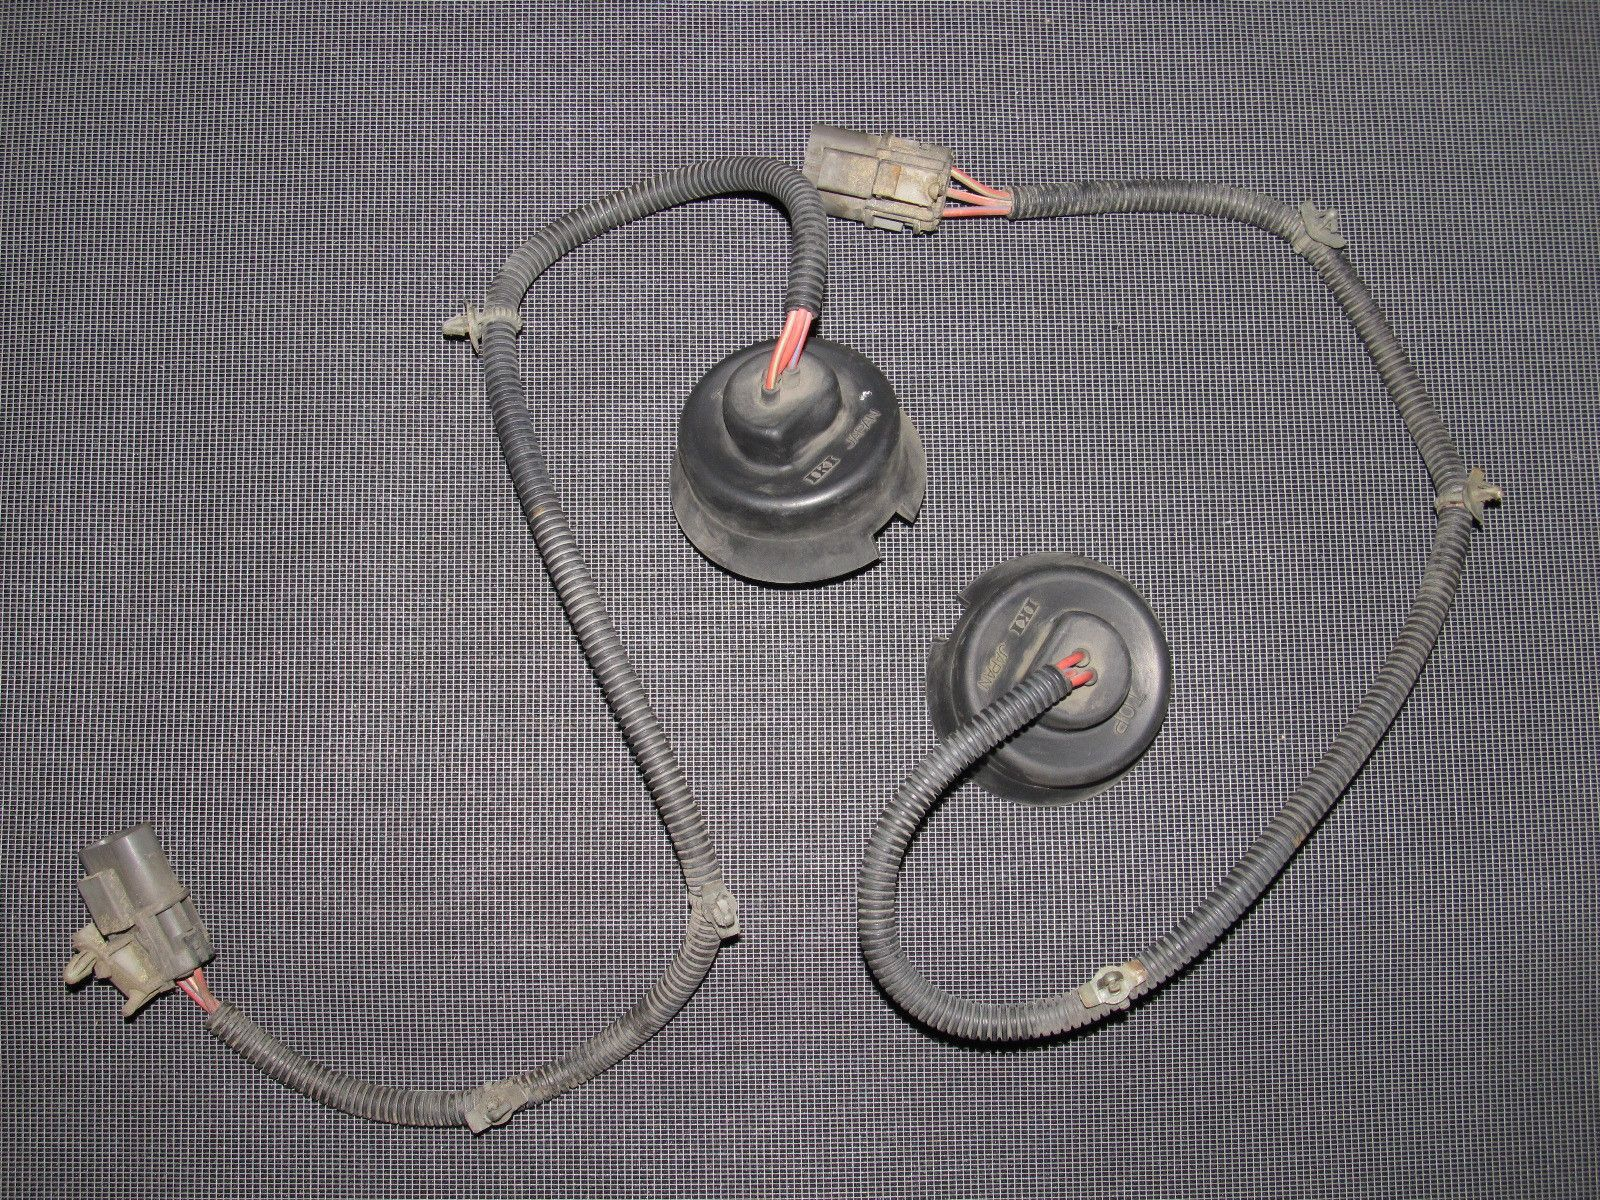 small resolution of 240sx headlight wiring wiring diagram database 1989 nissan 240sx headlight wiring 240sx headlight wiring